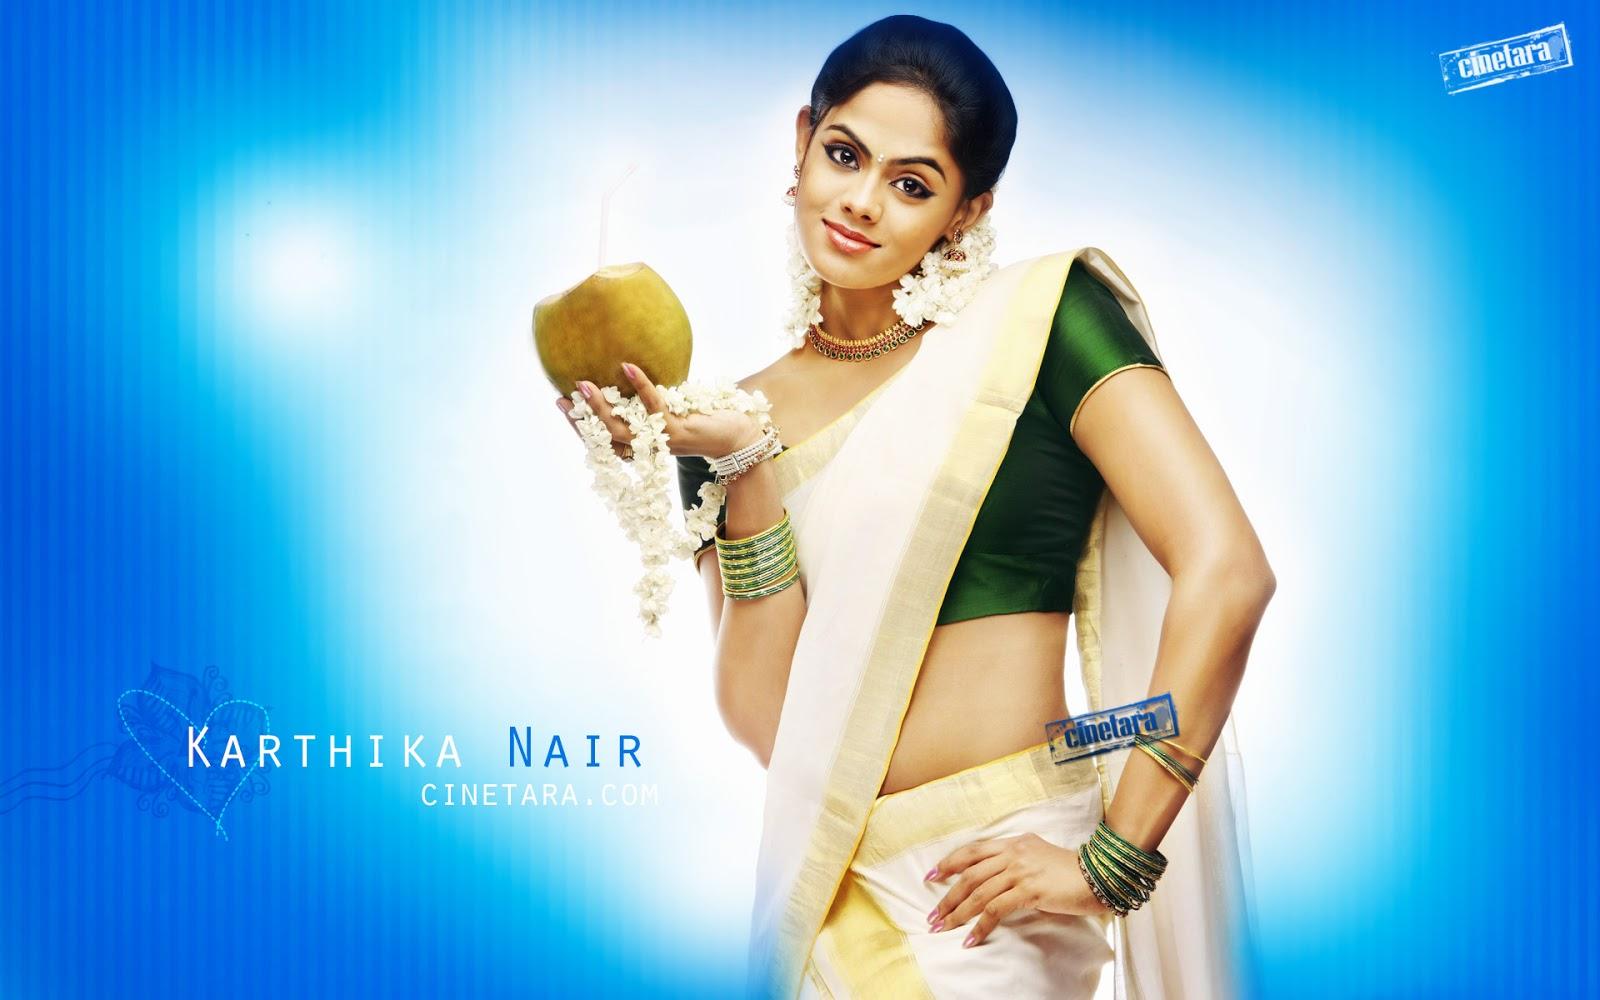 http://4.bp.blogspot.com/-GEWIYHZ1yhA/UK-3CzehKGI/AAAAAAAA5Nw/Tab0MT0h9c8/s1600/Indian+and+Telugu+Actress+HQ+Desktop+Wallpapers+Cinema65+(36).jpg